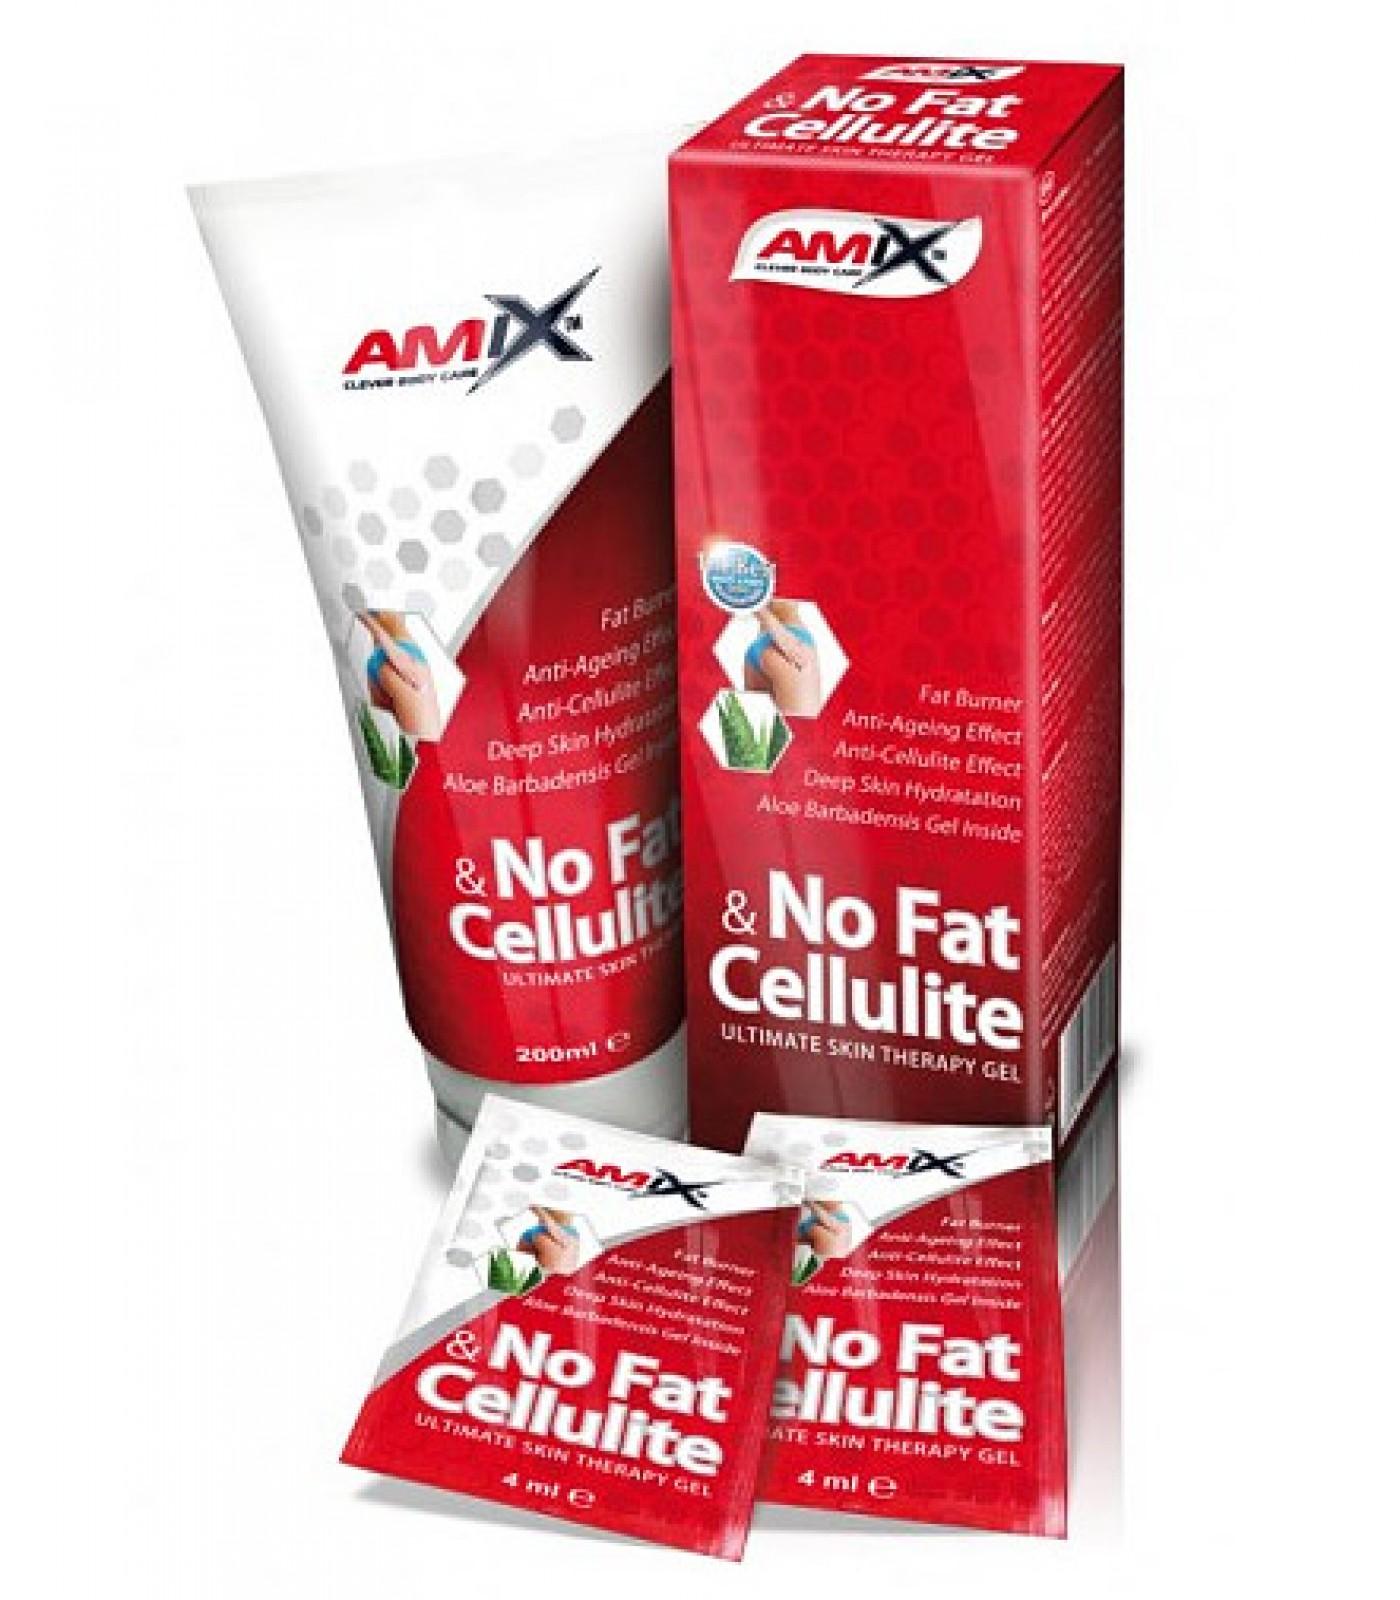 Amix - No Fat & Cellulite Gel / 200ml.